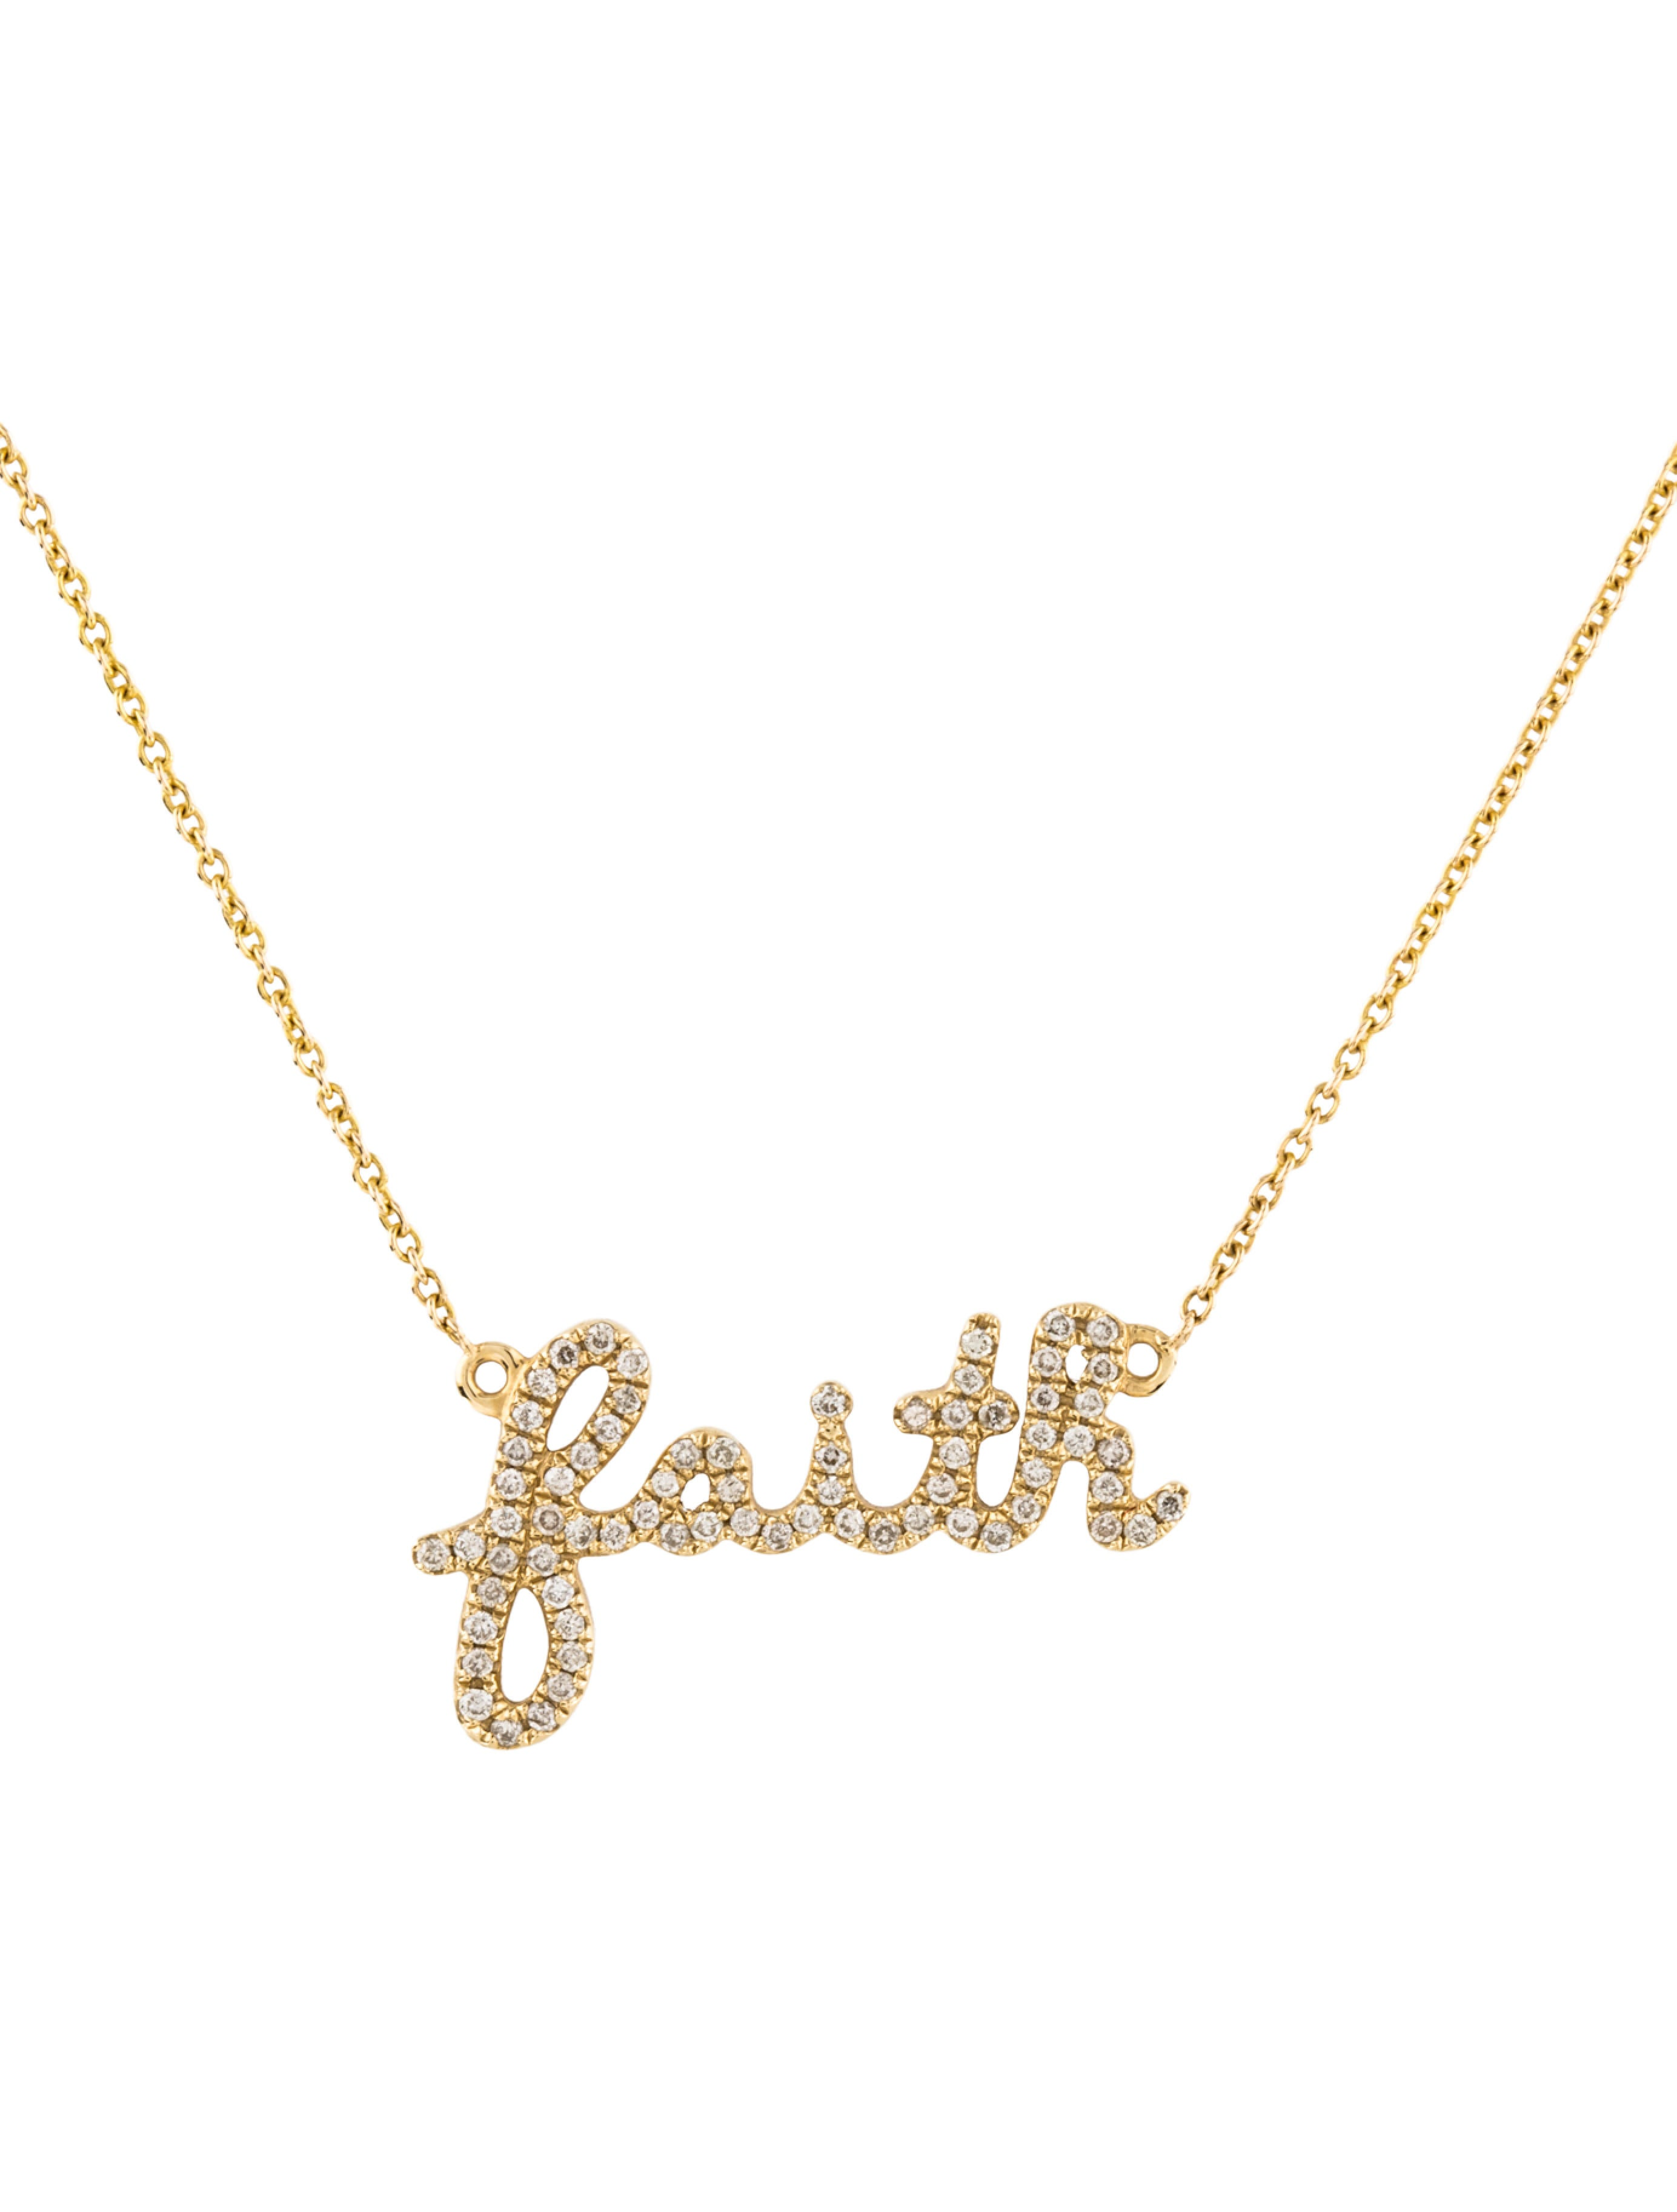 Sydney evan 14k diamond faith pendant necklace necklaces 14k diamond faith pendant necklace aloadofball Image collections